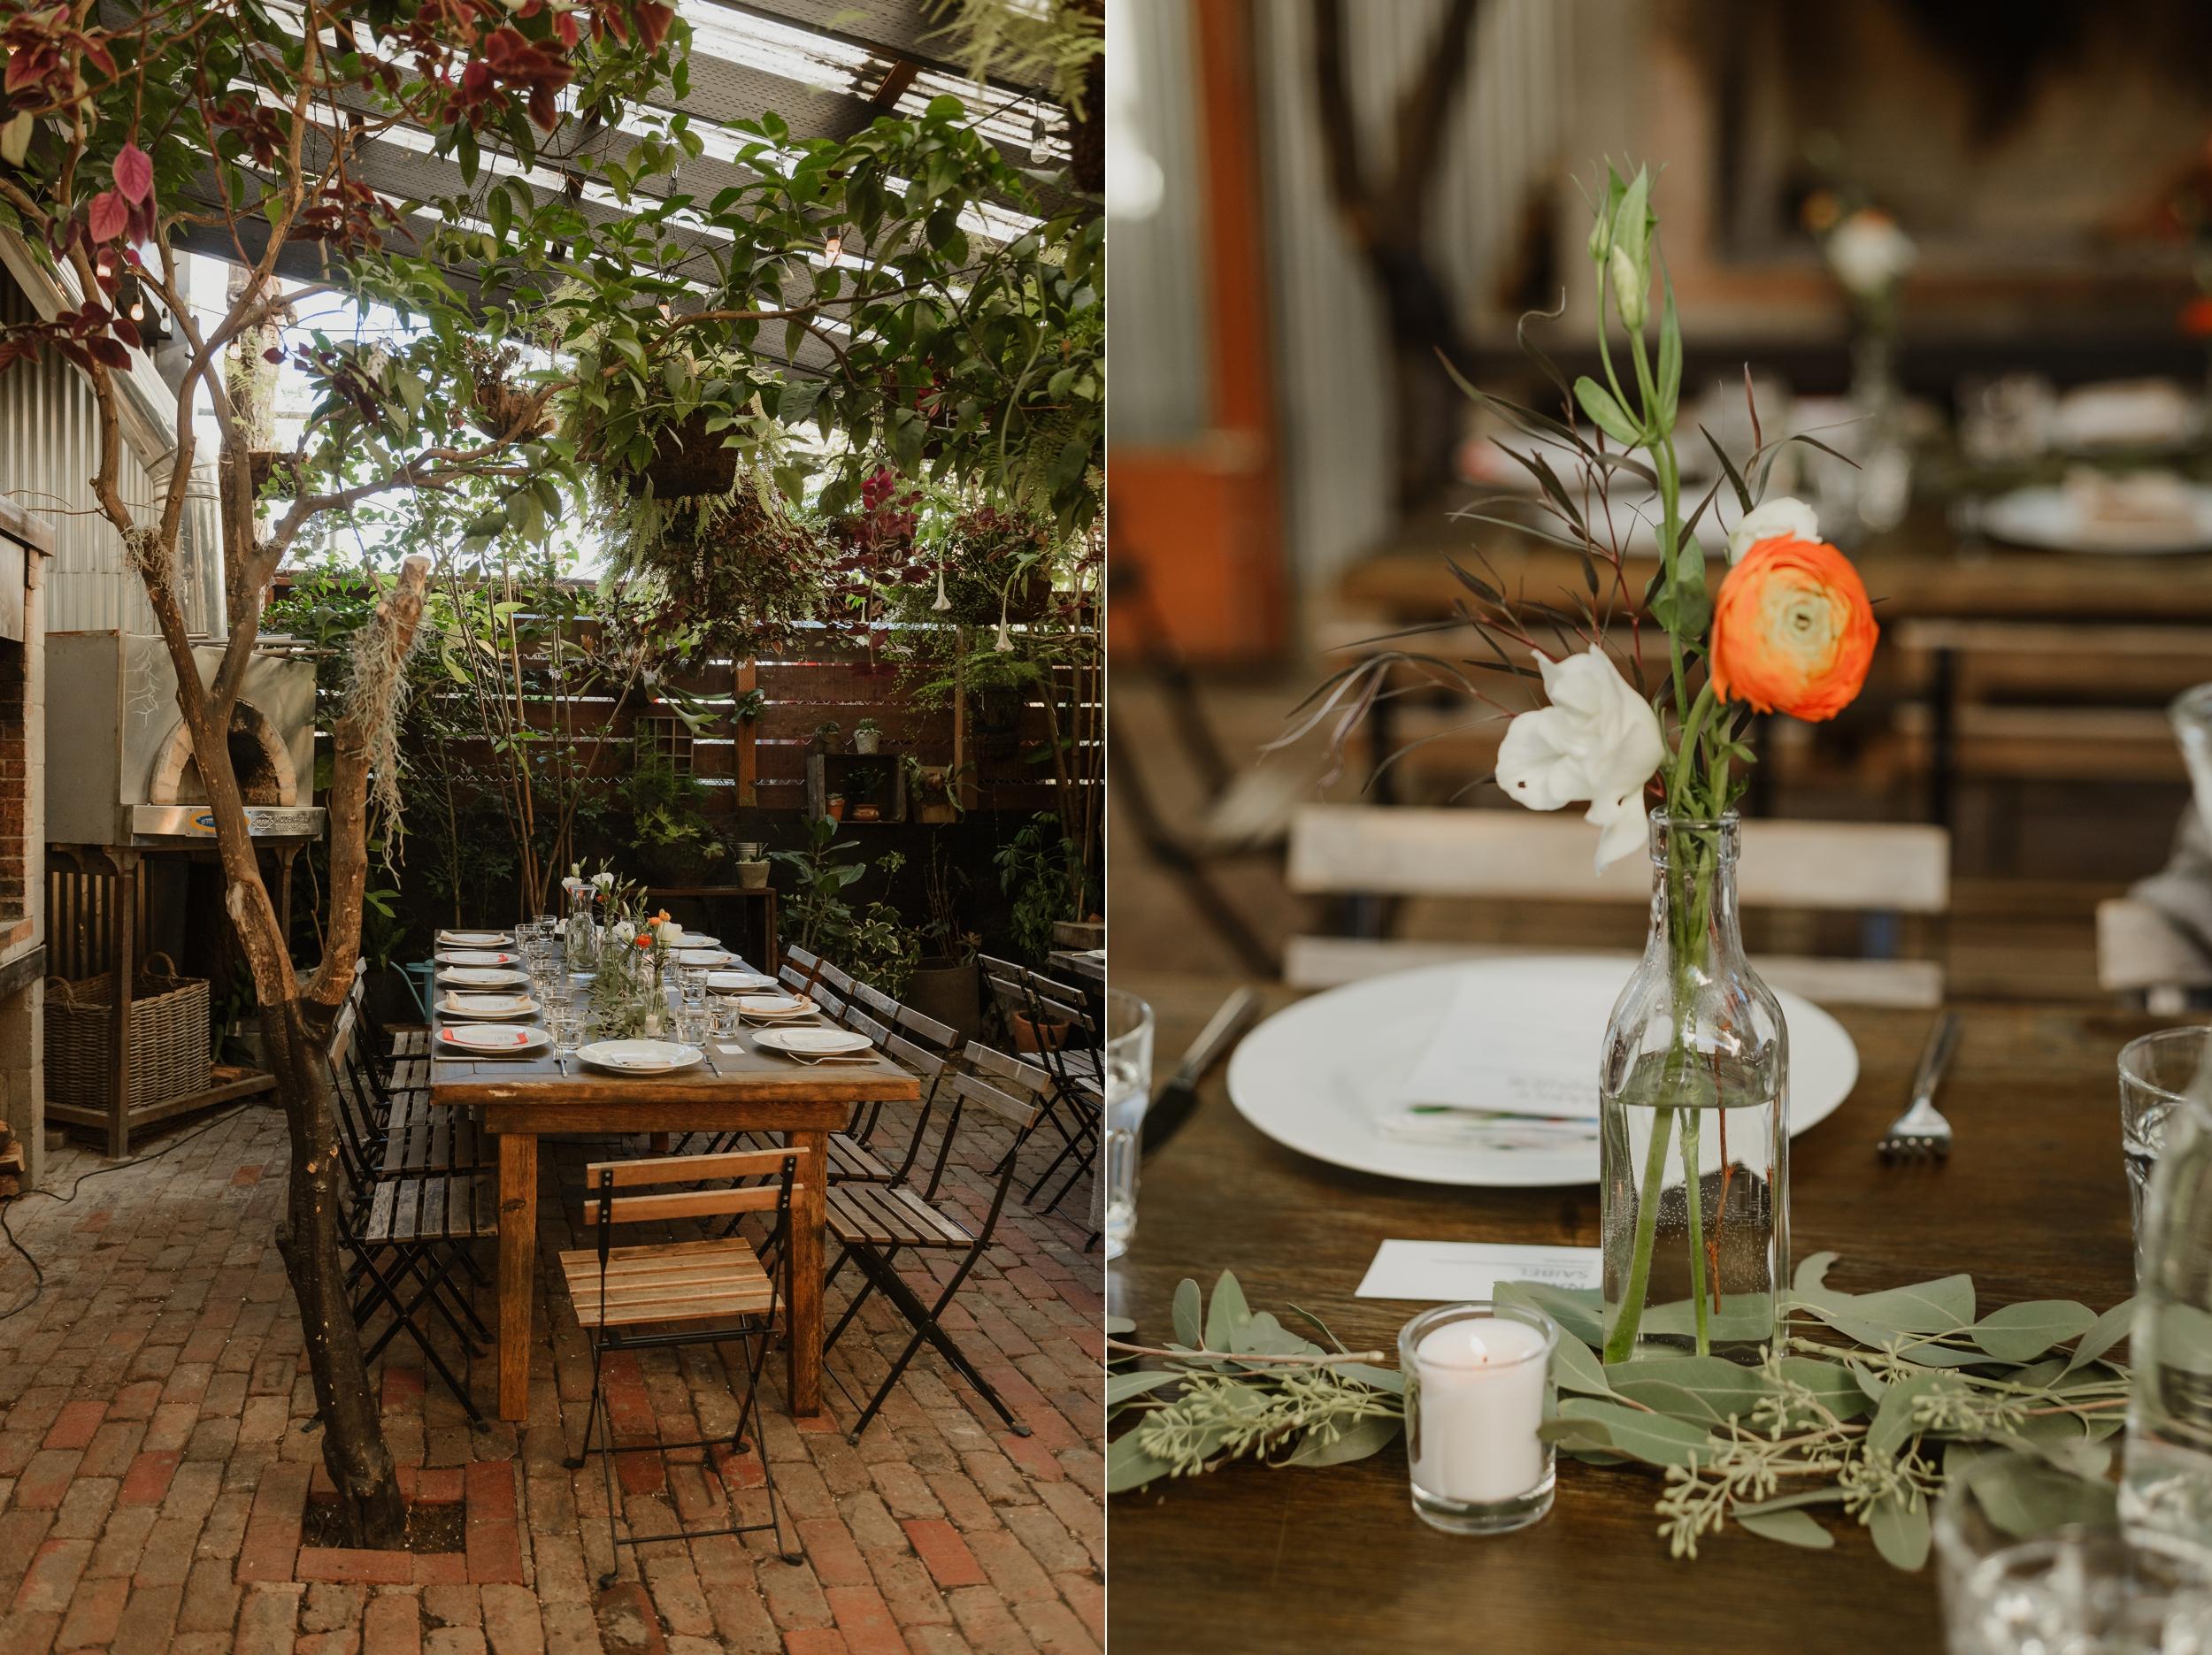 050-50-san-francisco-city-hall-stable-cafe-wedding-vivianchen-056_WEB.jpg